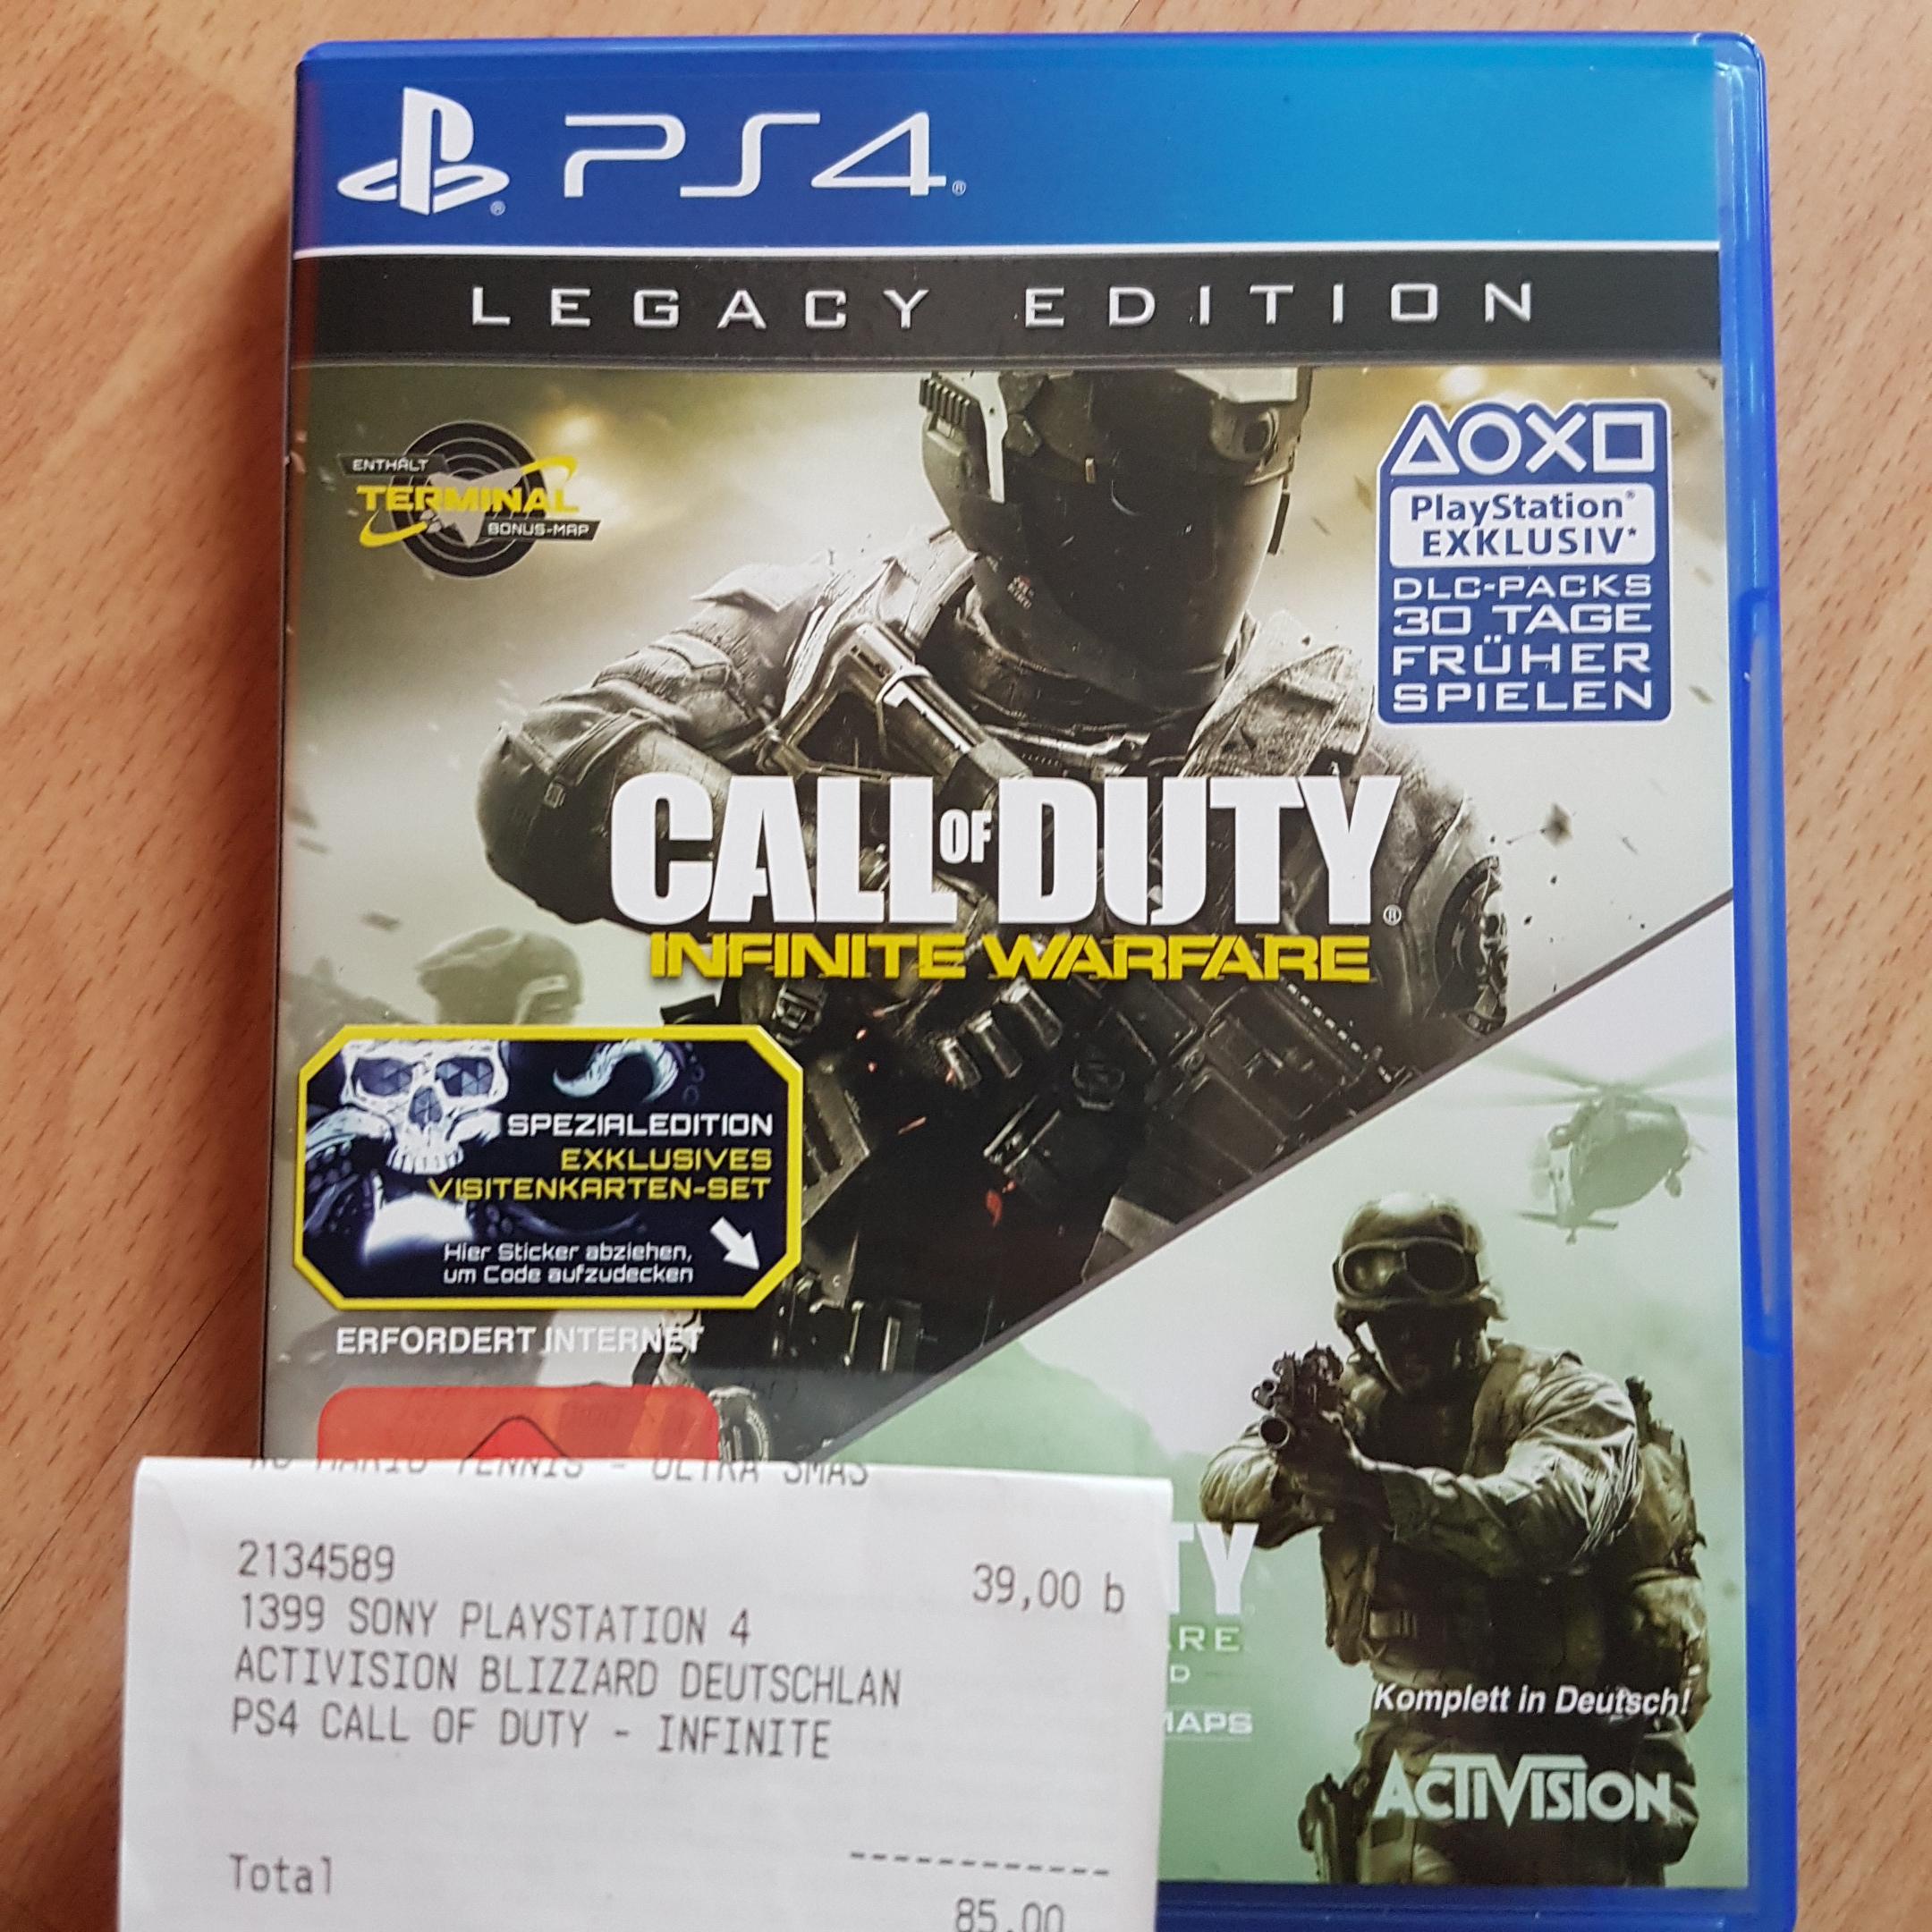 [LOKAL MEDIA MARKT AALEN] Call of Duty: Infinitiv Warefare Legacy Edition PS4